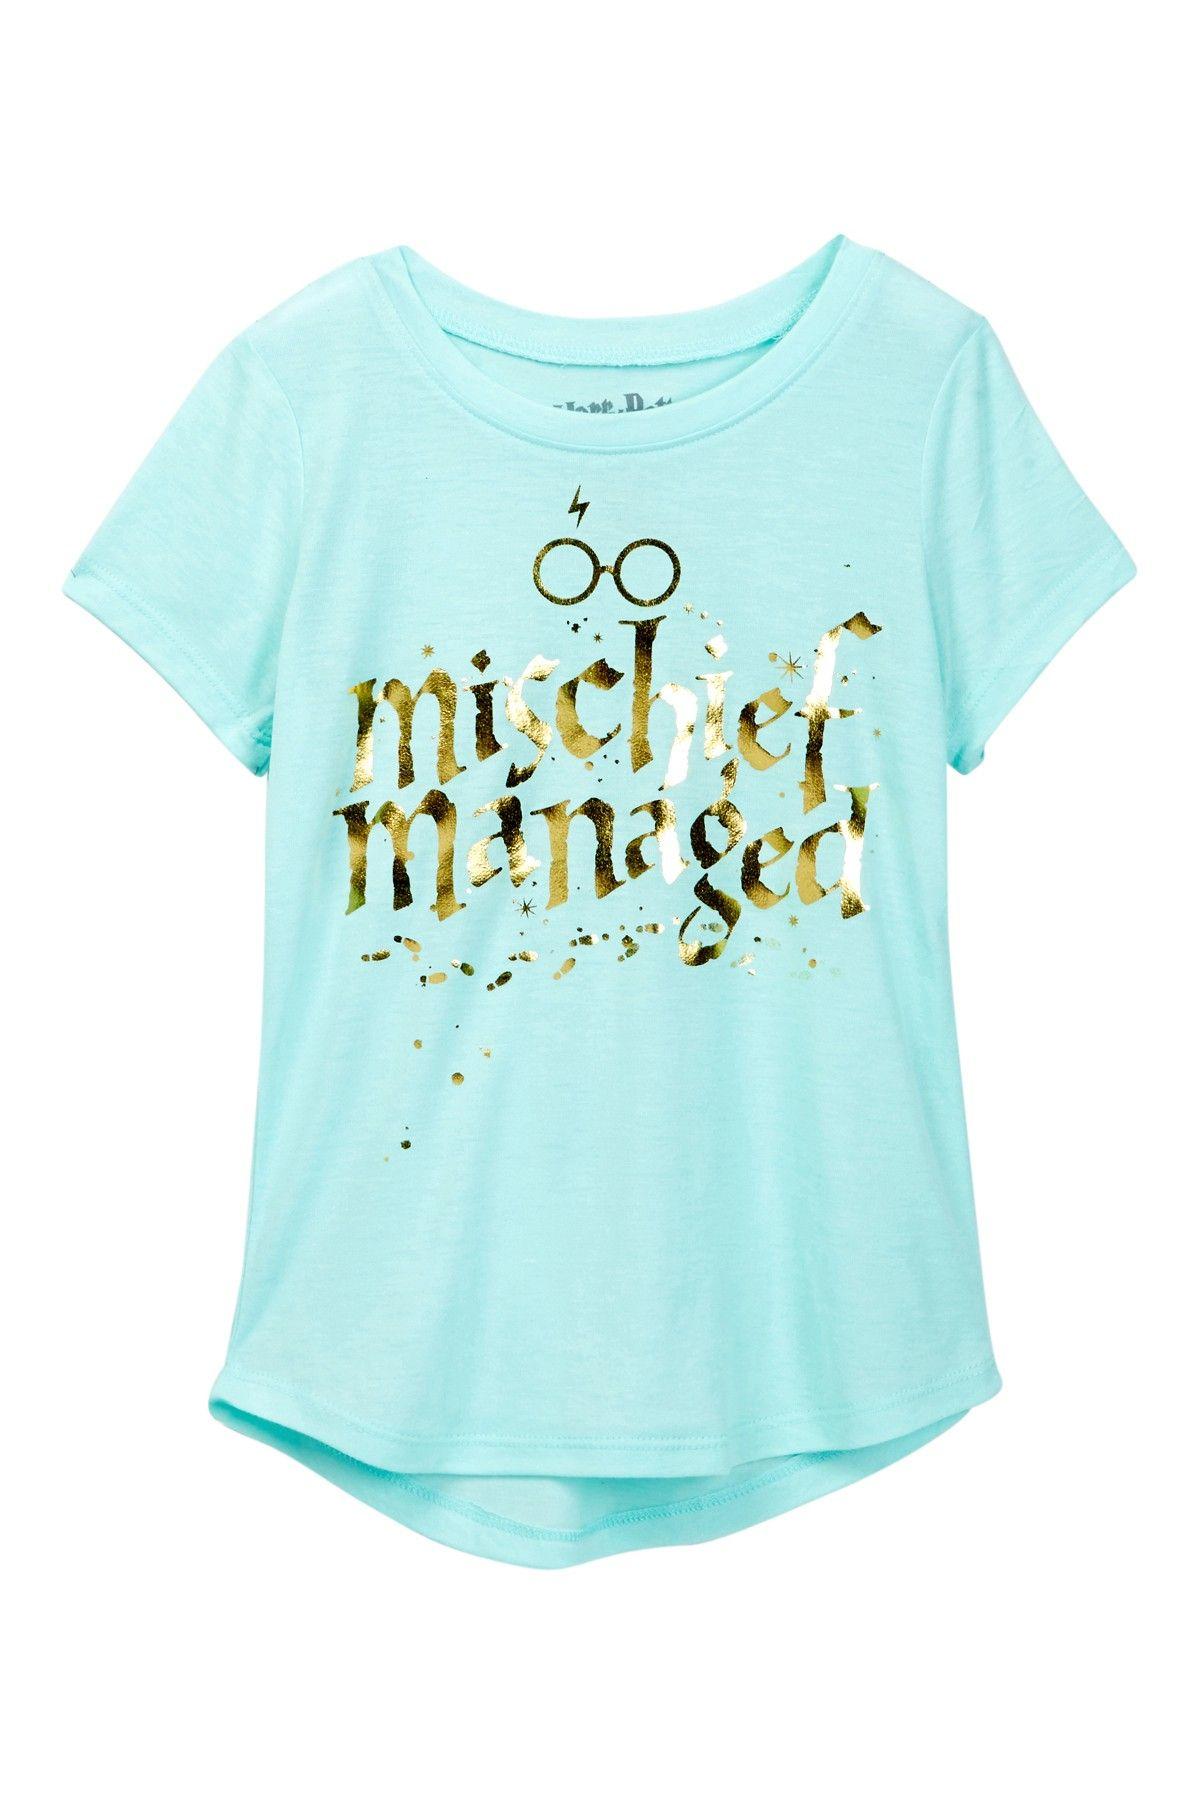 5ffdca85a Harry Potter Mischief Managed Tee (Little Girls & Big Girls ...